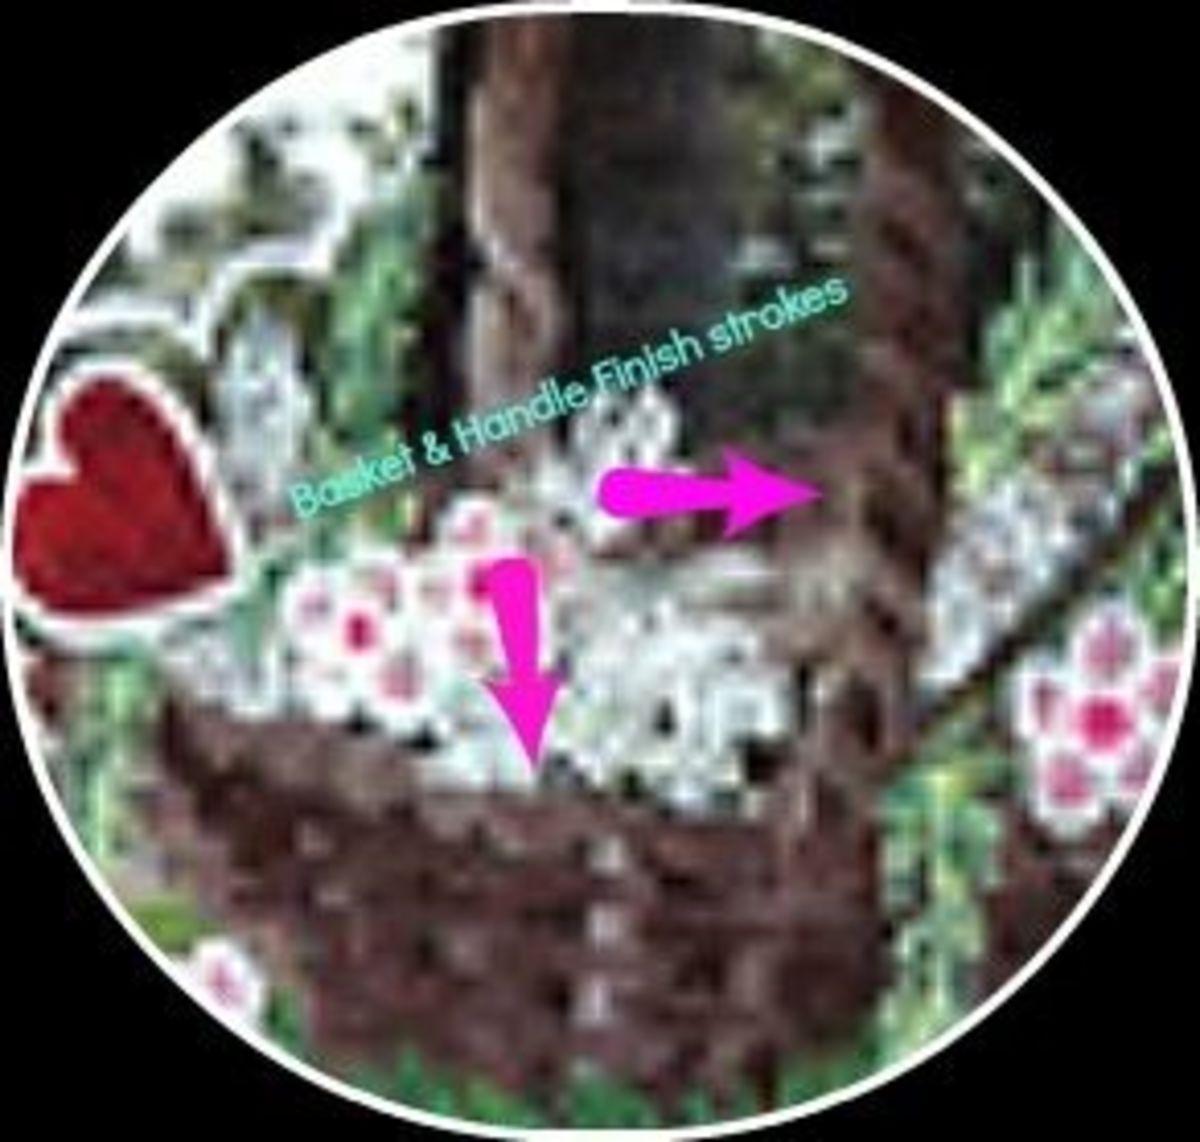 Valentine's Day Basket Window Painting - Image M Burgess